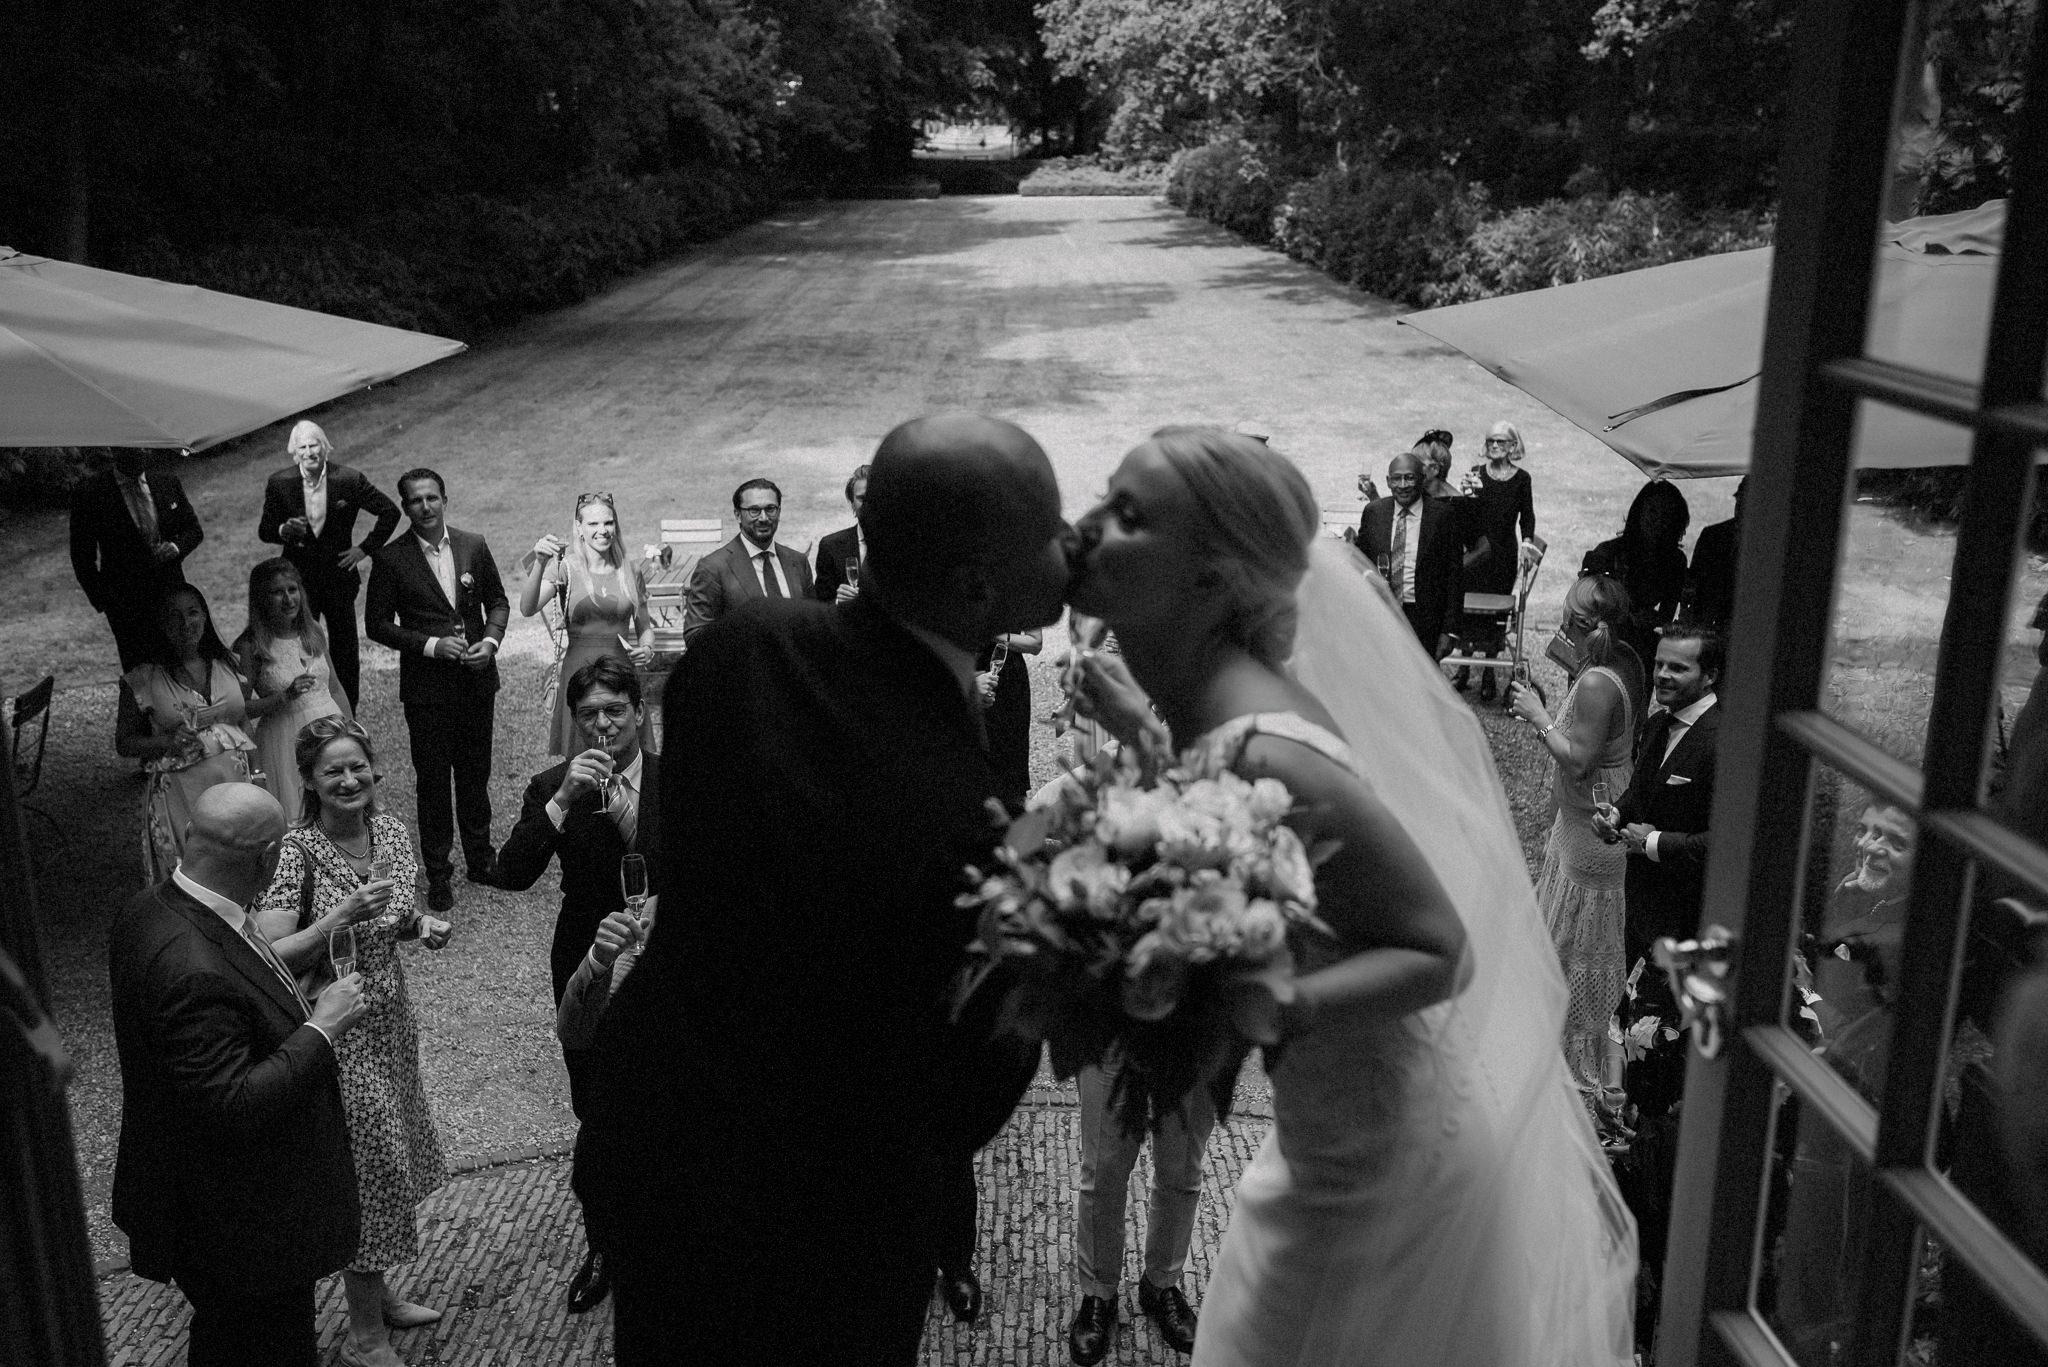 Bruidsfotografie Buitenplaats Sparrendaal - Naomi van der Kraan 0048.jpg